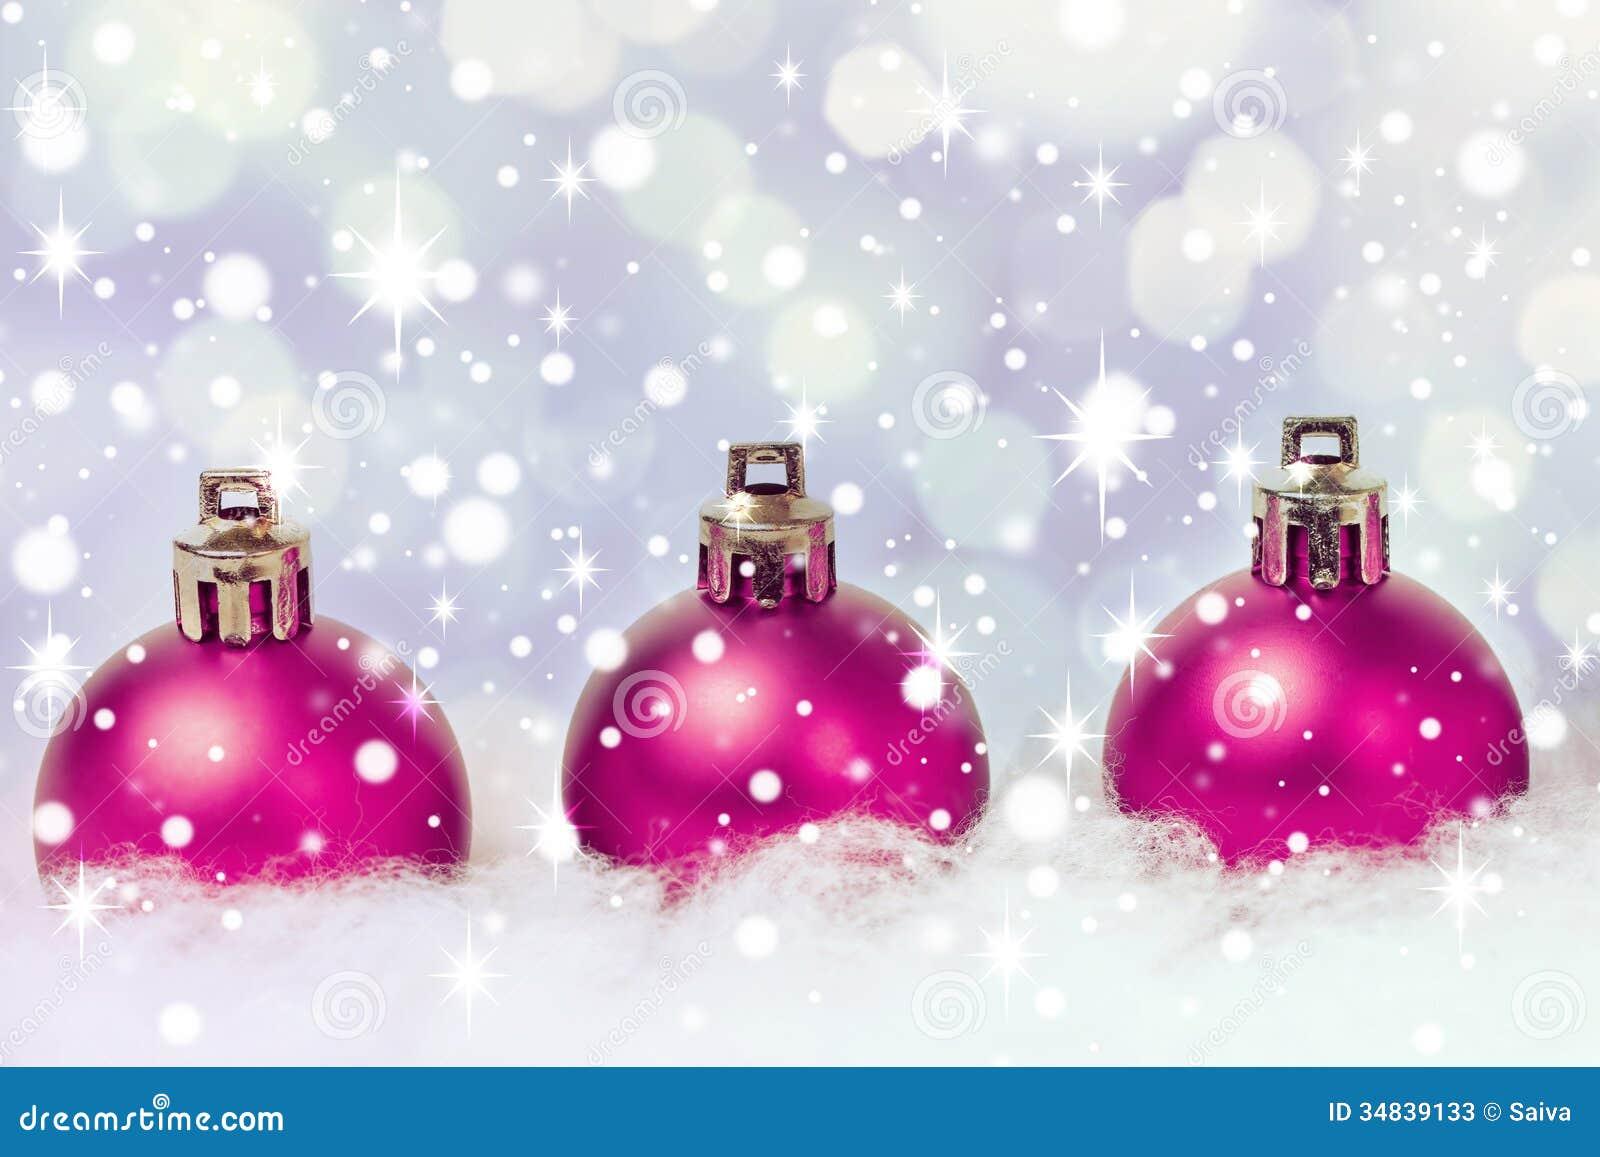 Purple Xmas Decorations